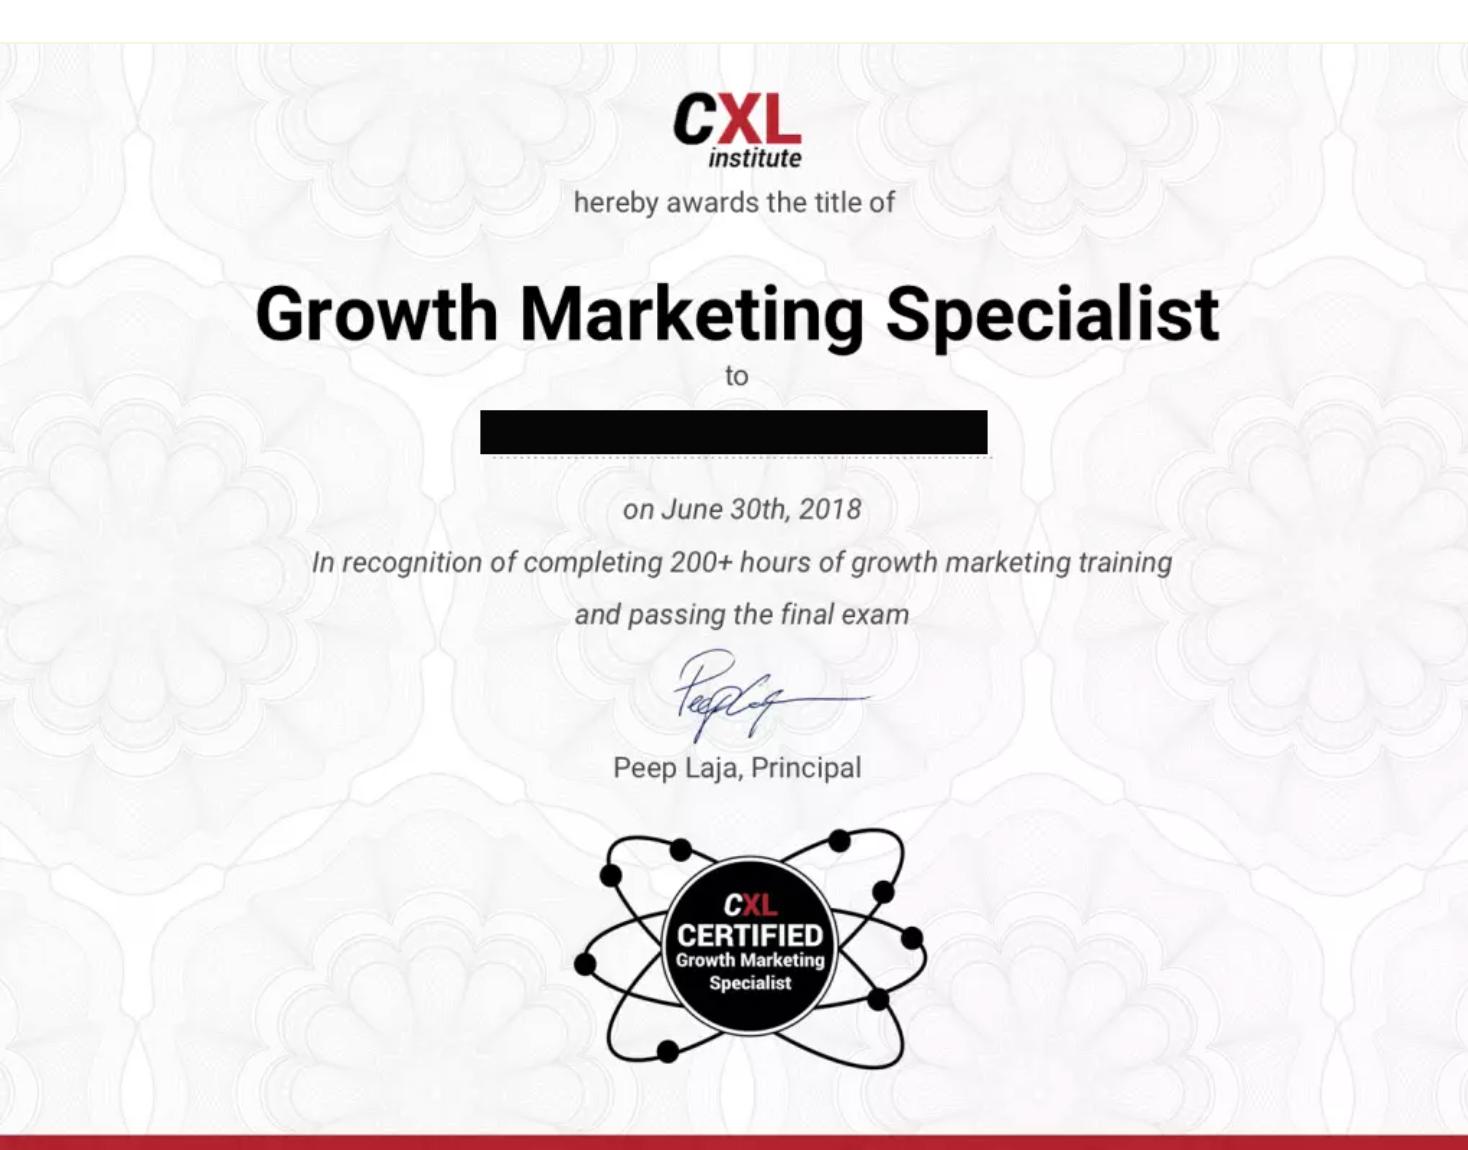 CXL growth marketing certification